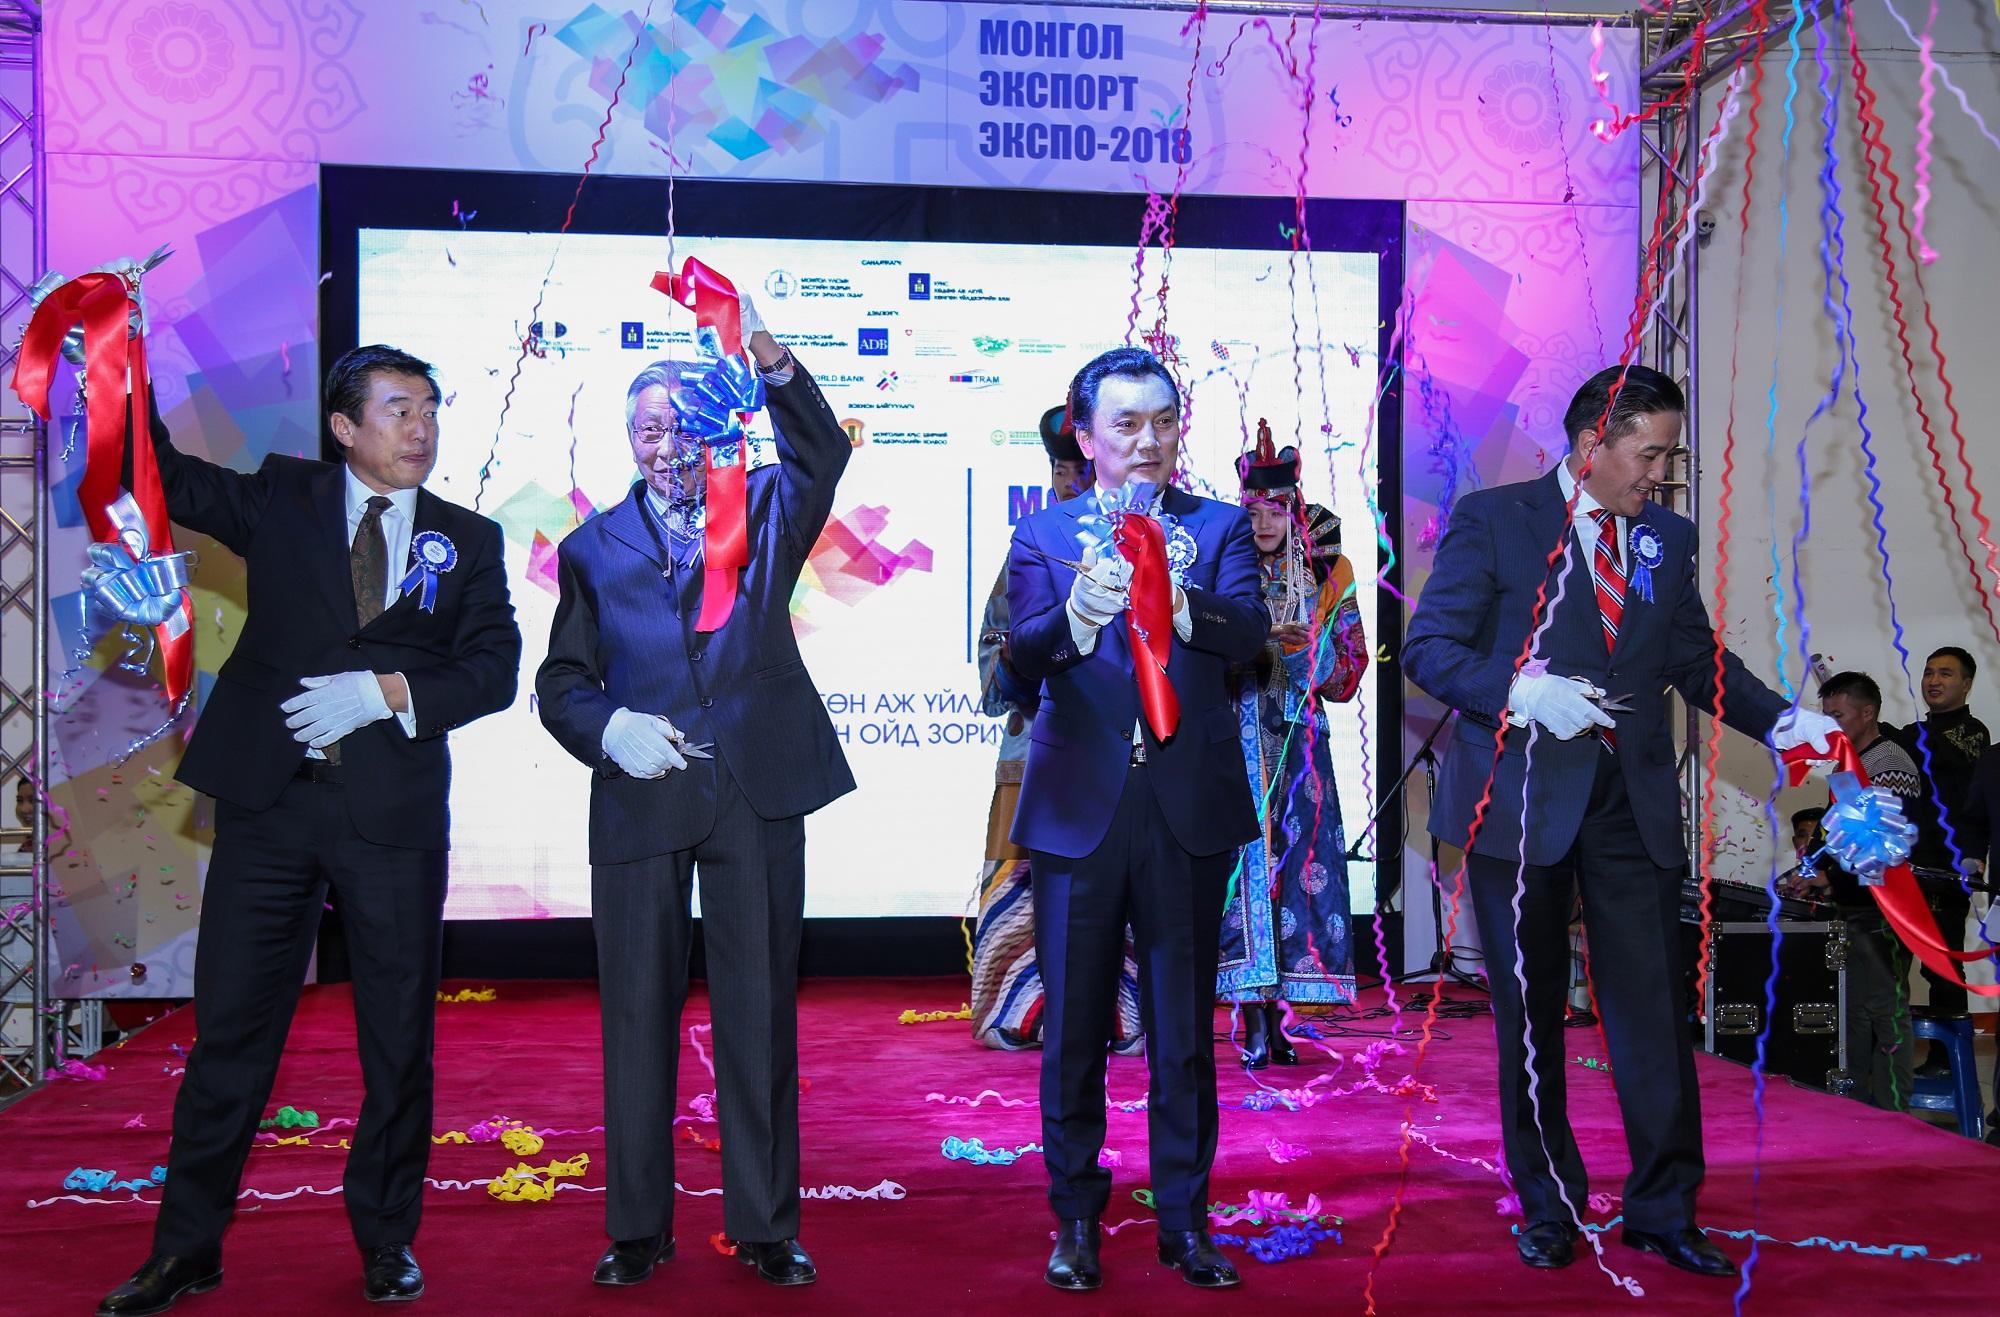 Монгол Экспорт-Экспо 2018